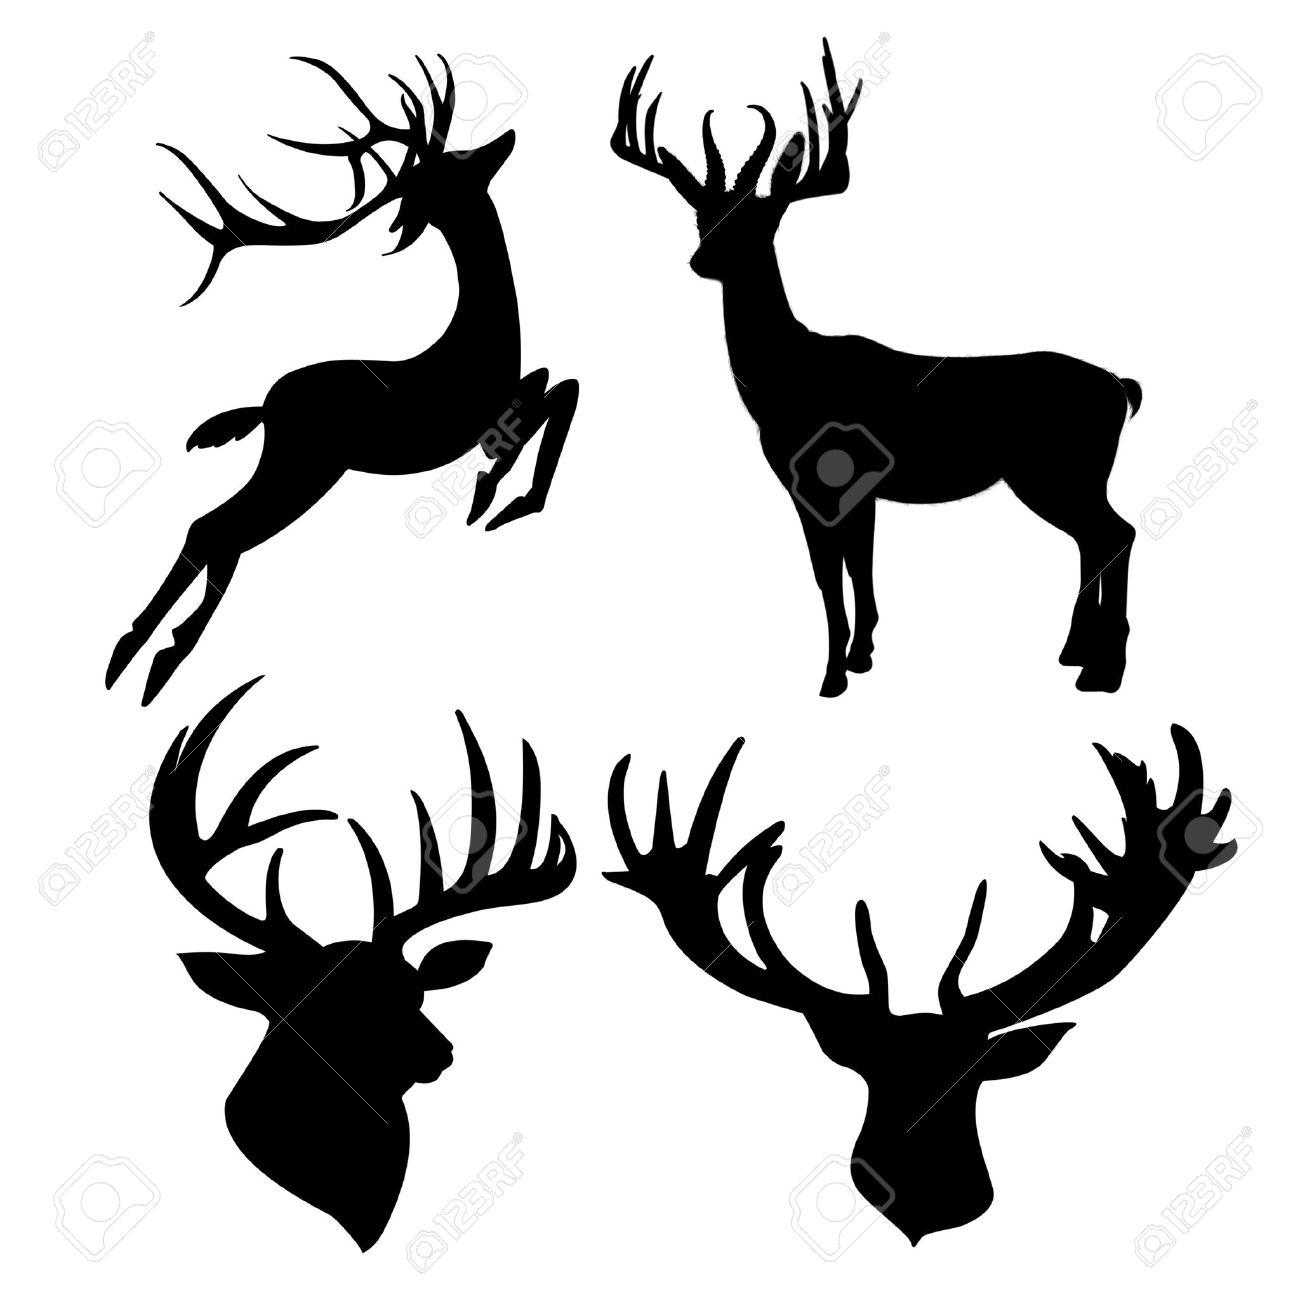 6,062 Elk Stock Vector Illustration And Royalty Free Elk Clipart.